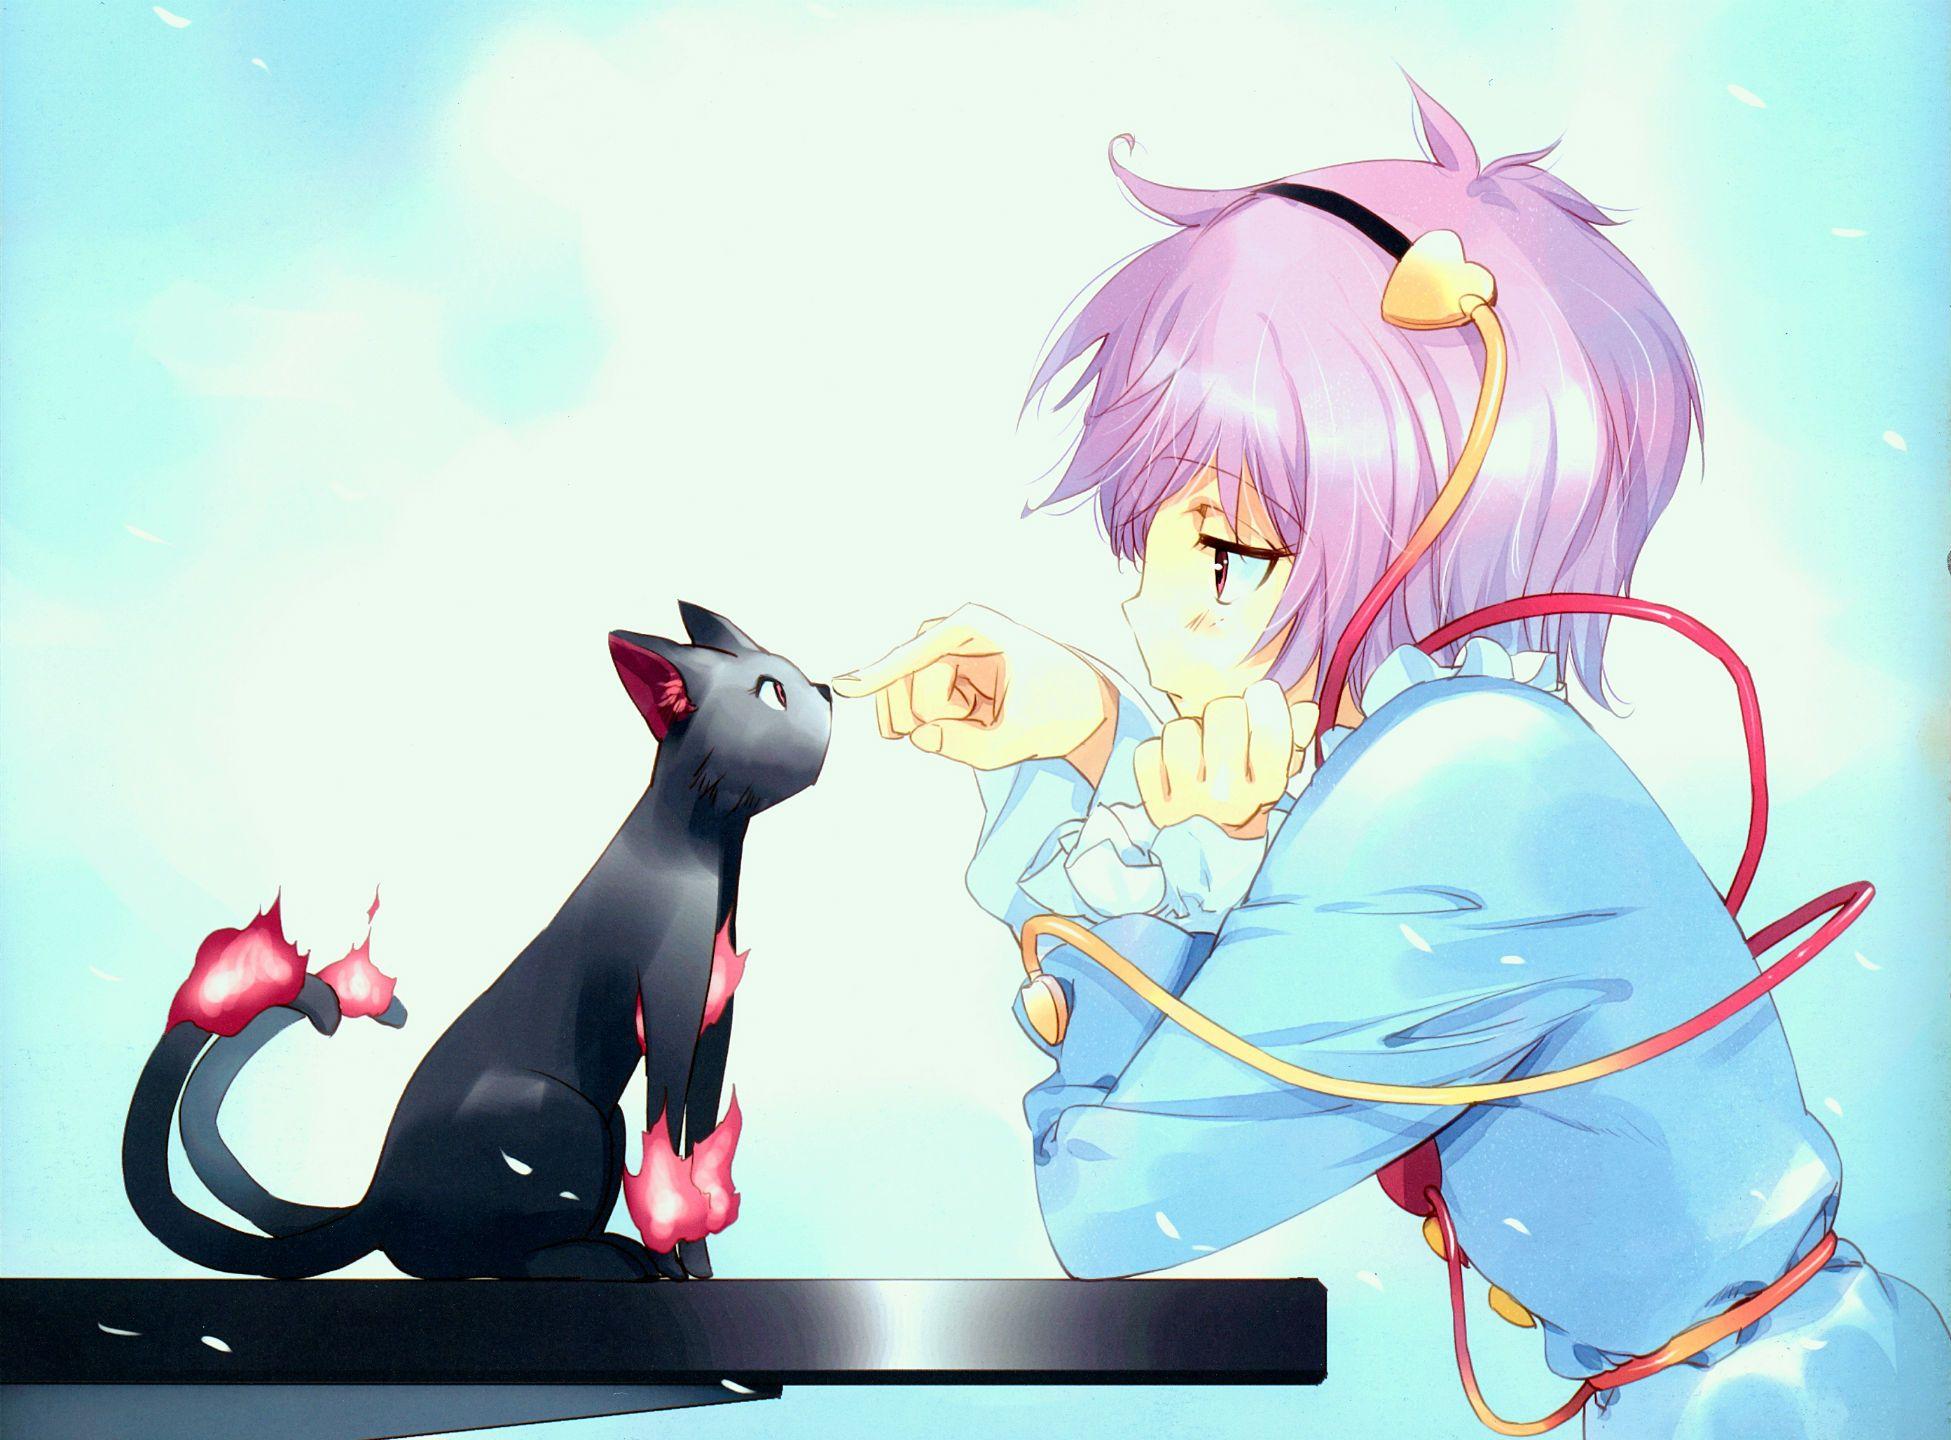 Anime Touhou Wallpaper 四月は君の嘘, 猫 アニメ, 古明地さとり